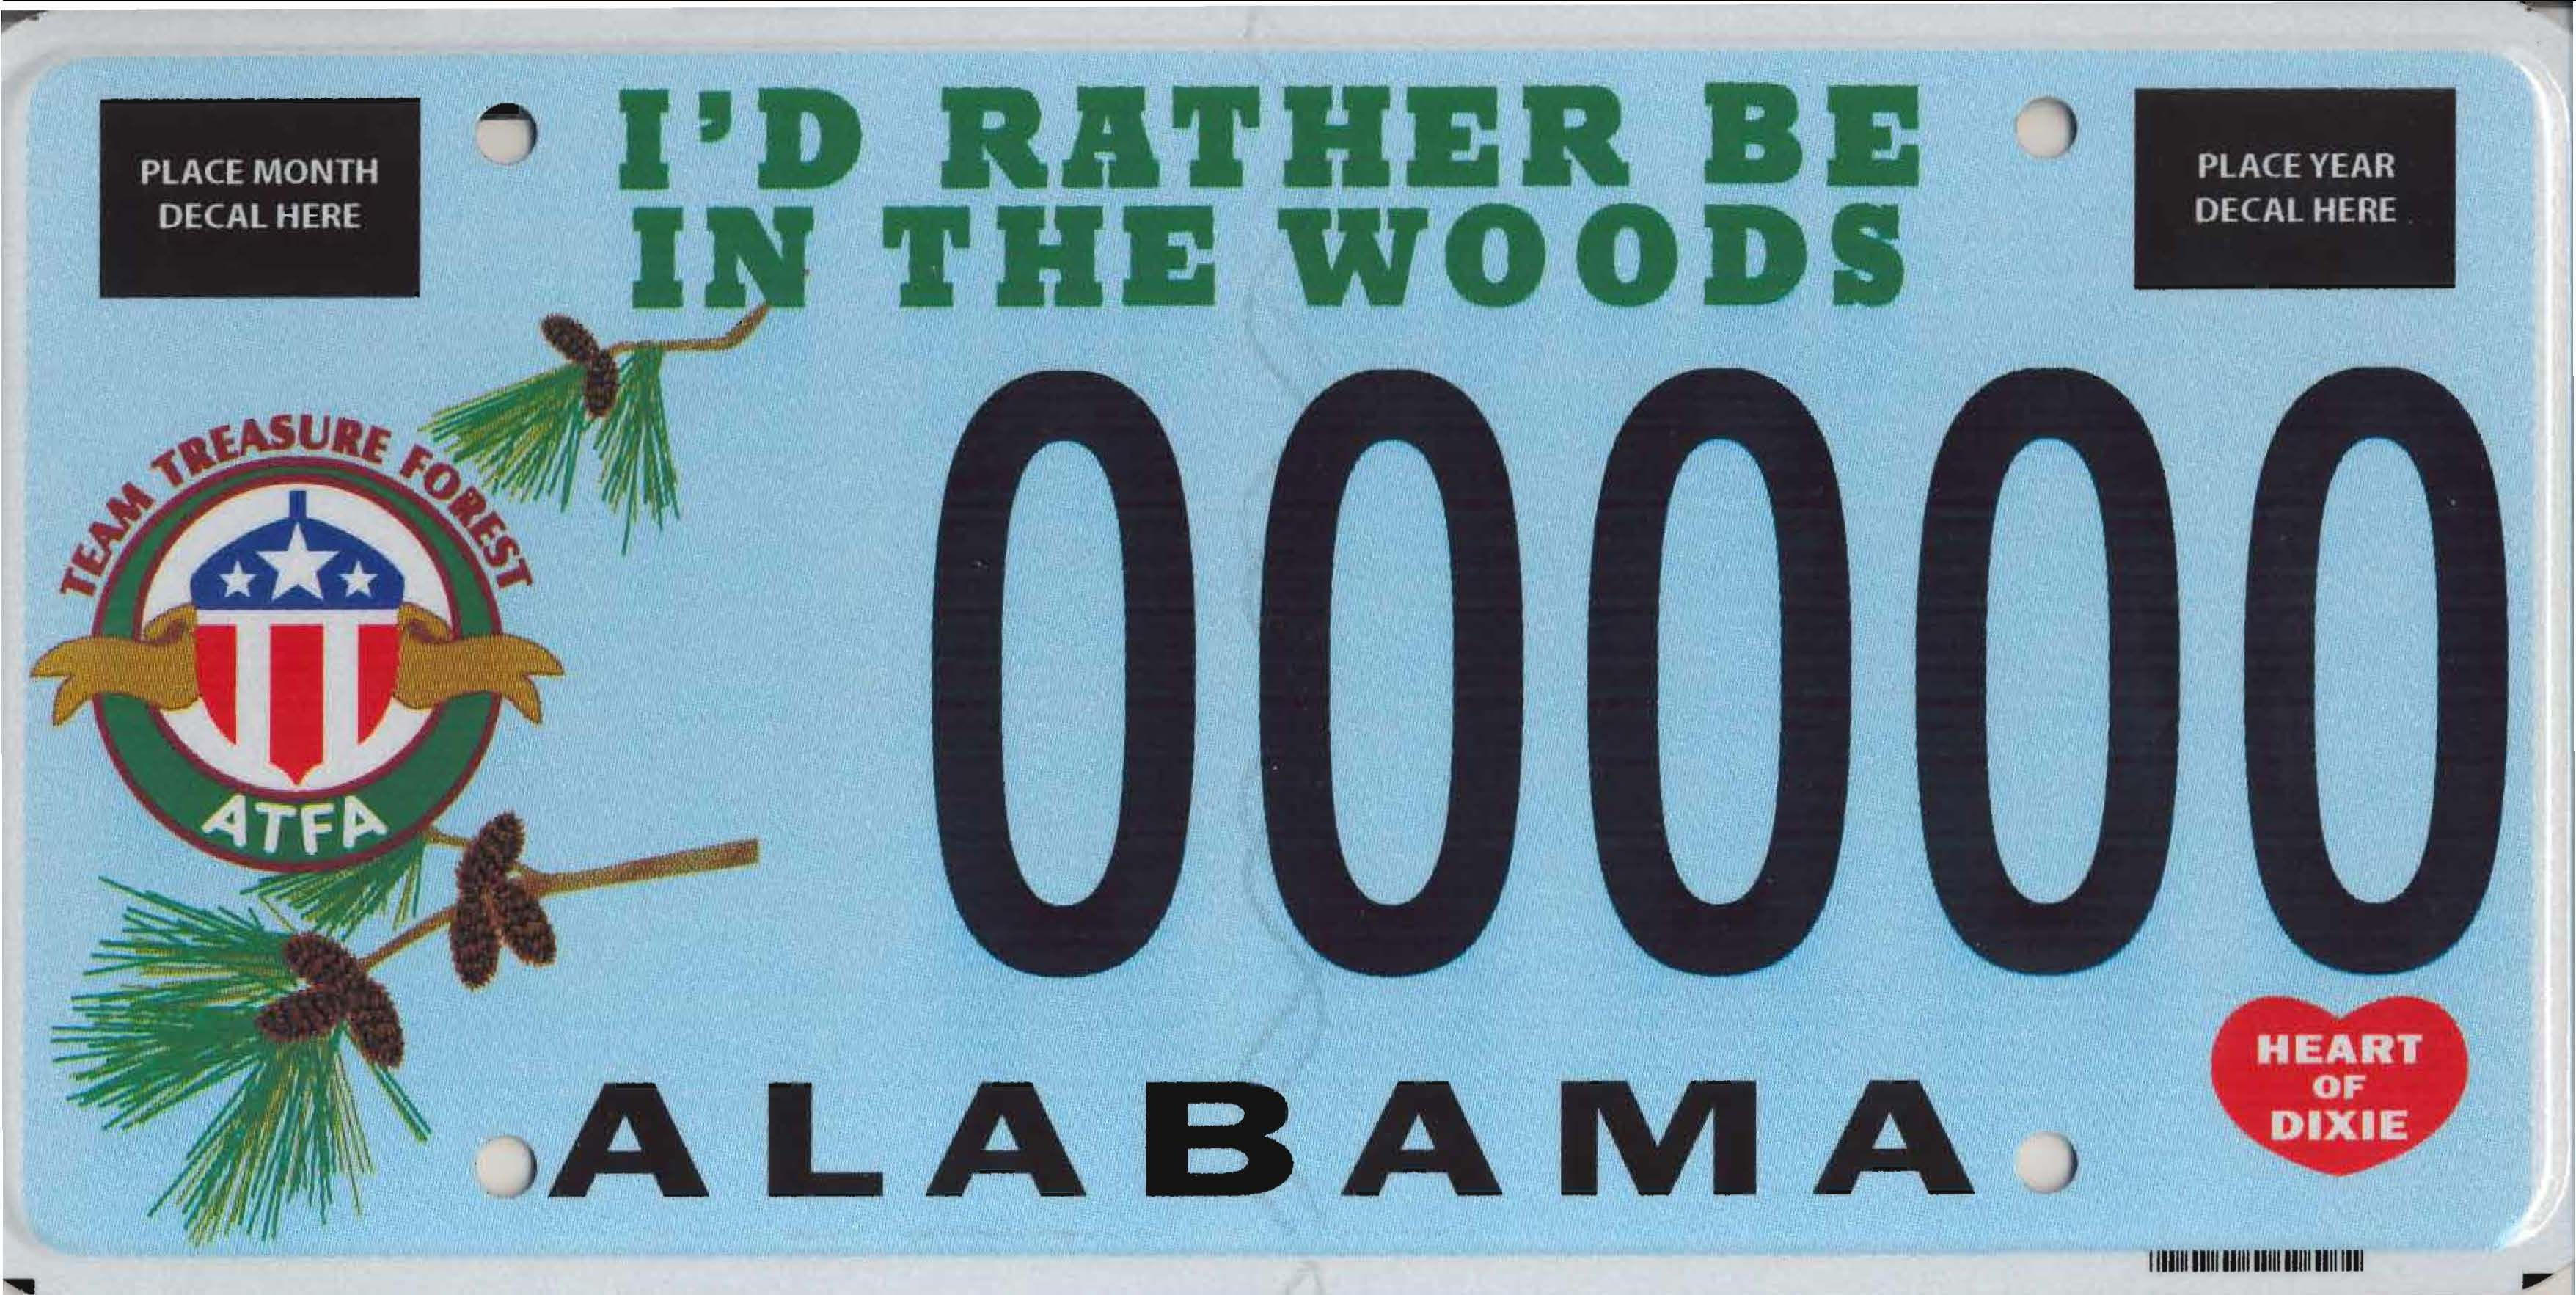 e5791eb9ad16f19f93fb485833174e43 - How To Get A Personalized License Plate In Alabama